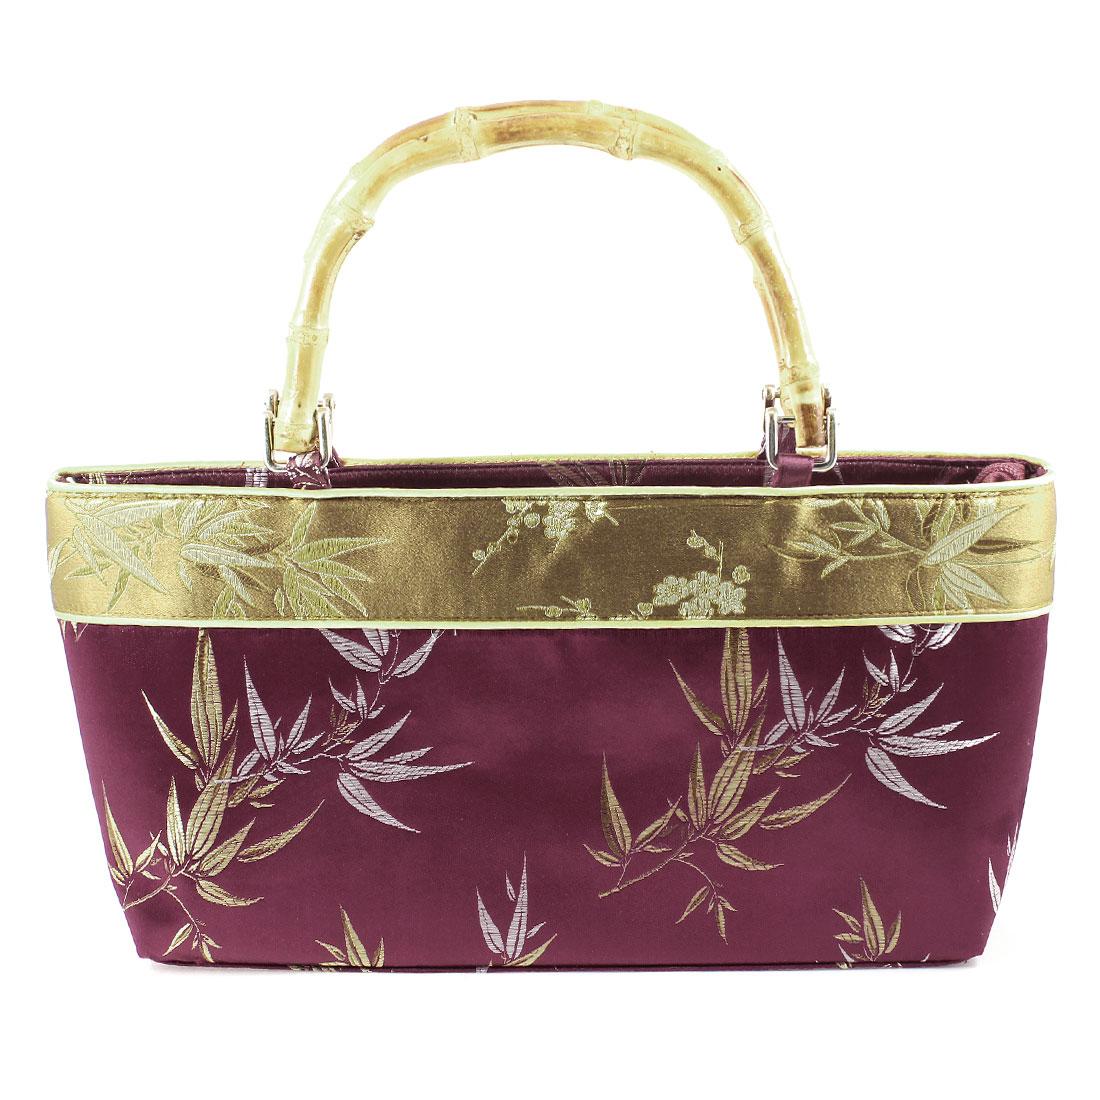 Woman Nylon Lining Zip Up Embroider Bamboo Leaf Print Burgundy Handbag